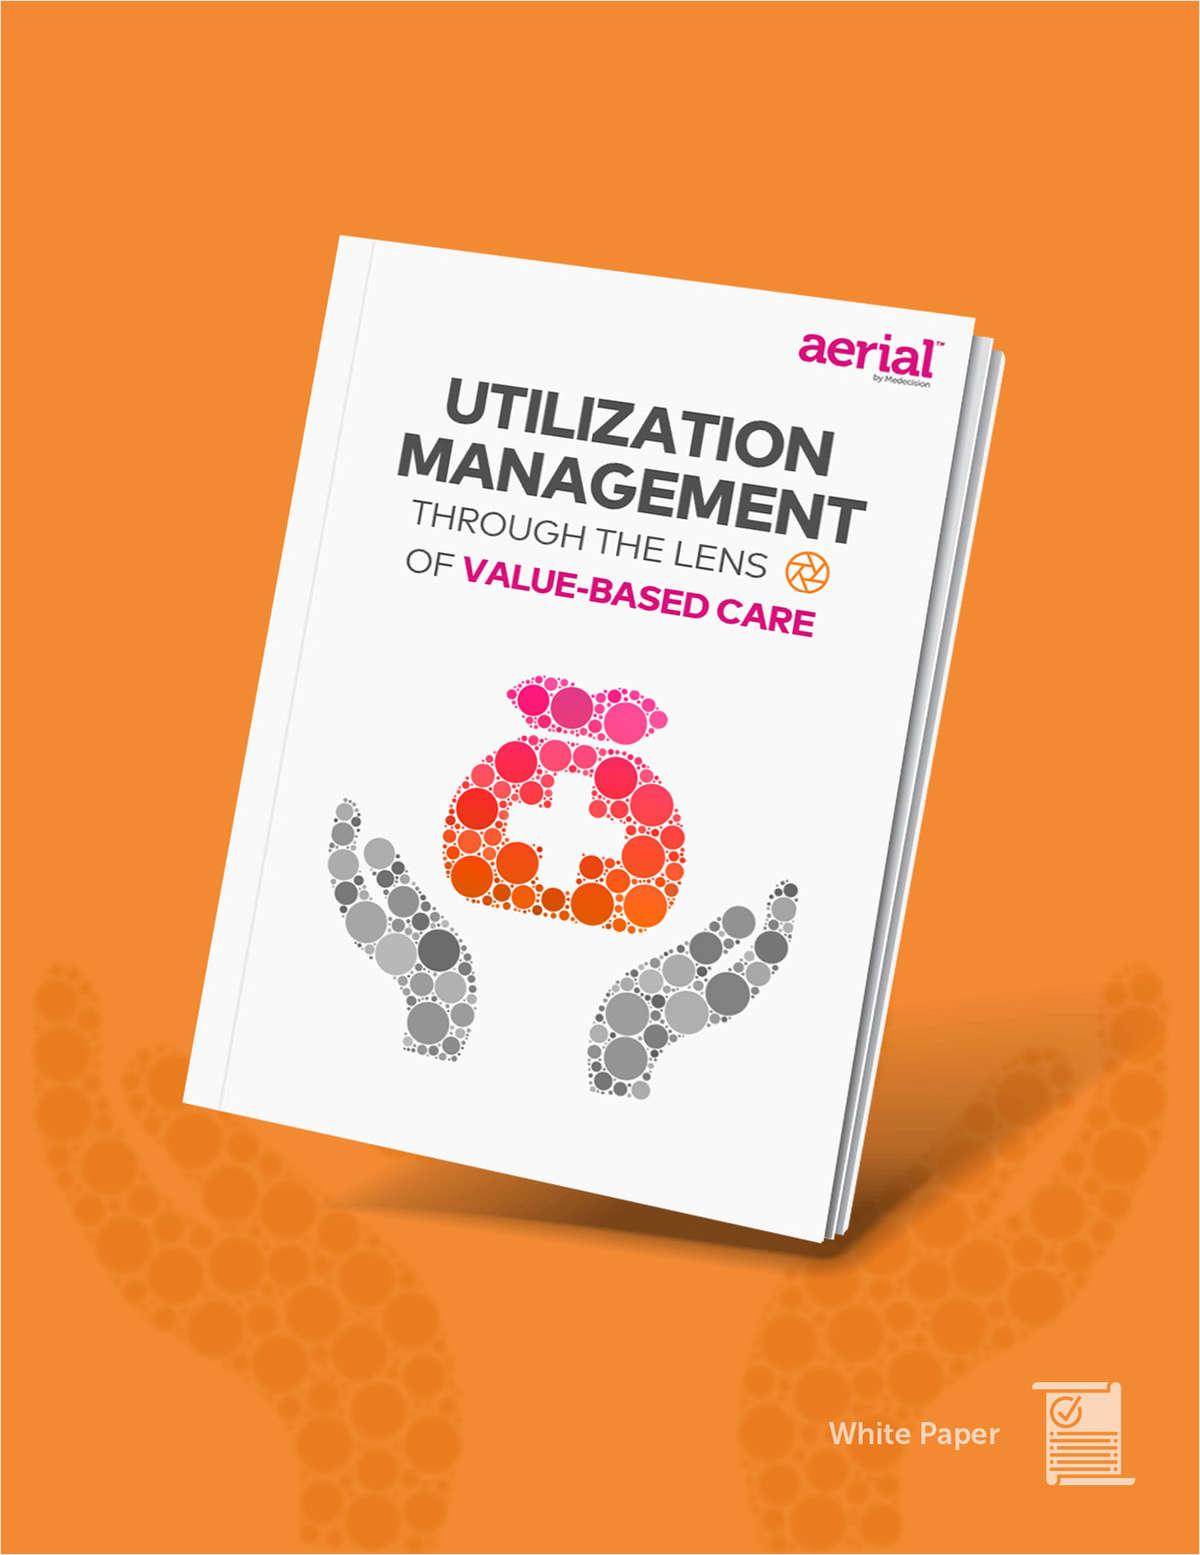 Utilization Management Through the Lens of Value-Based Care